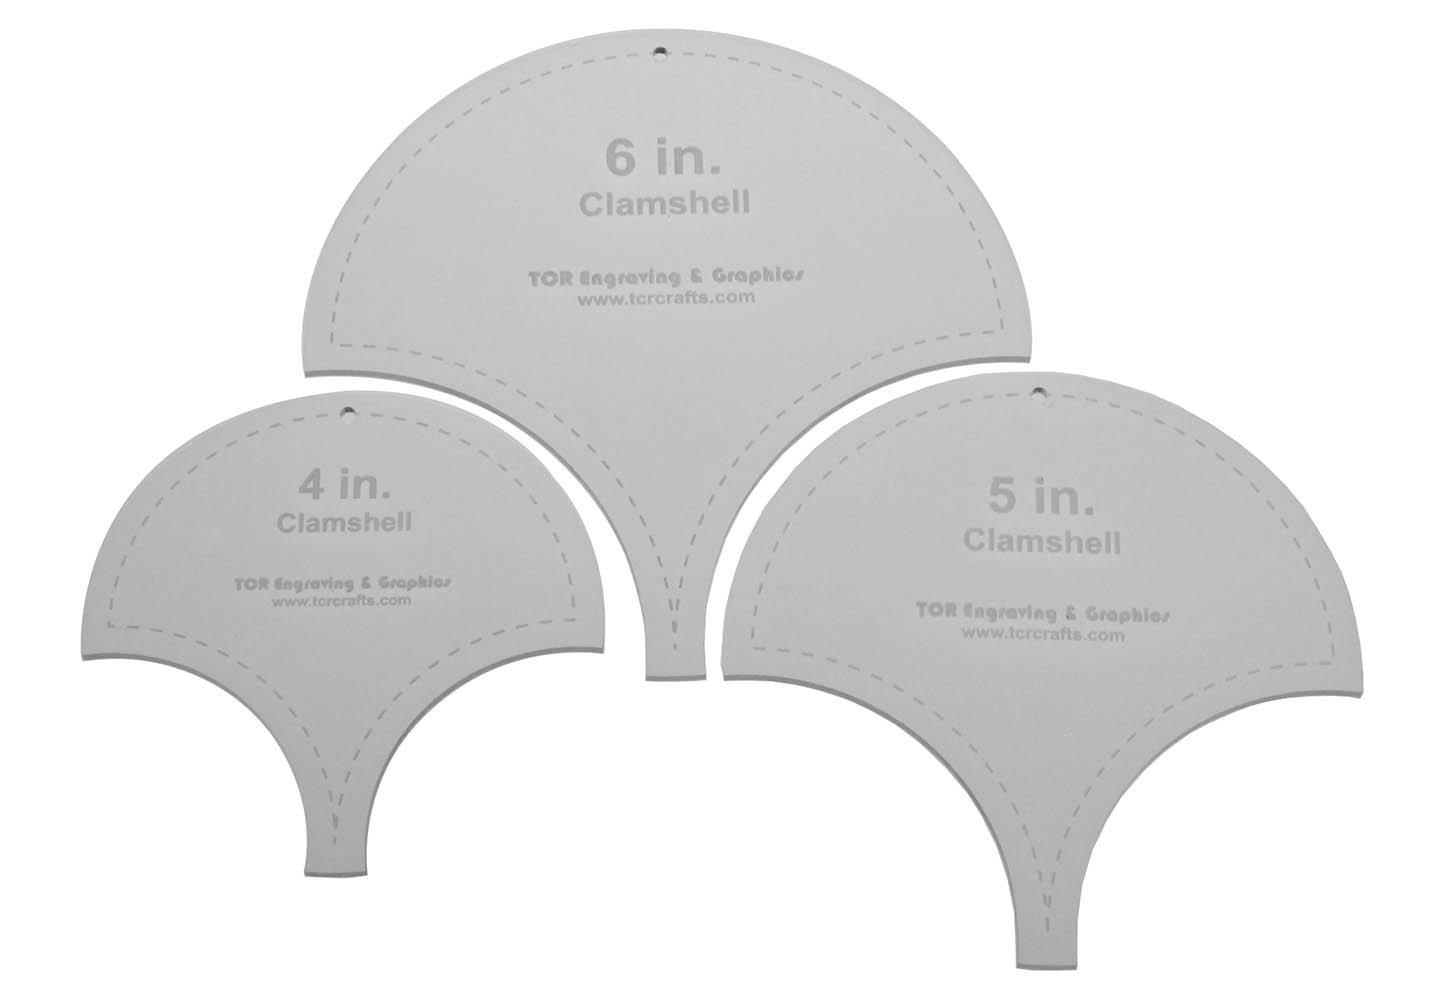 Clamshell Templates 4 6 5 - Clear Acrylic 1//8